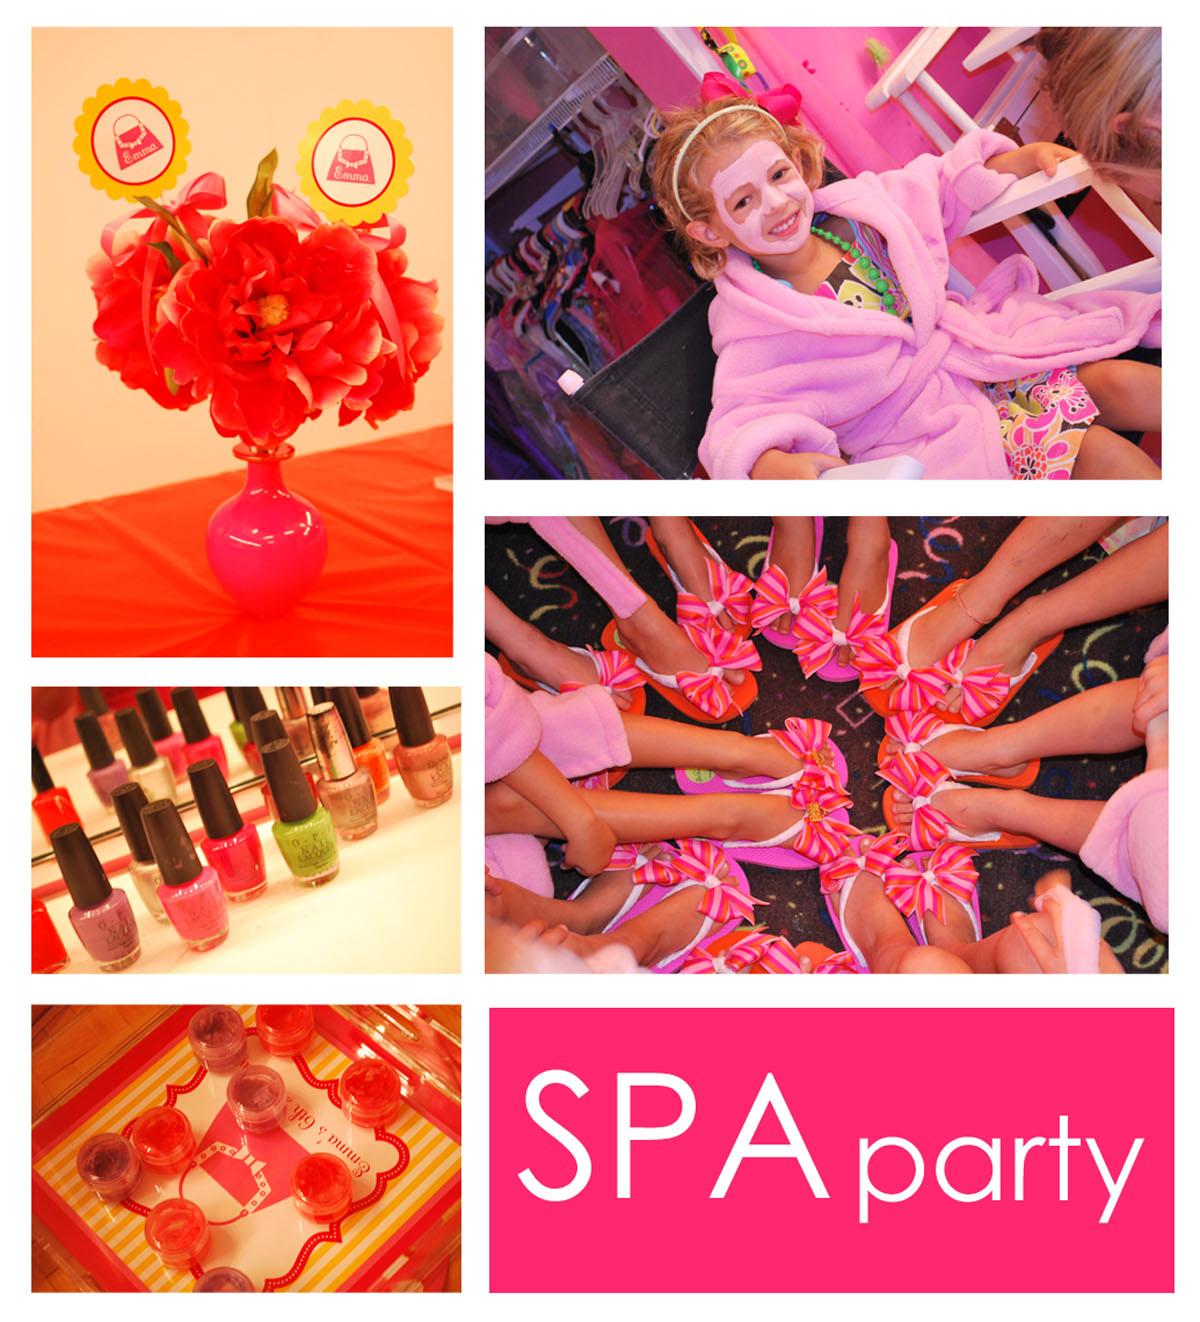 Little Girls Spa Party Supplies